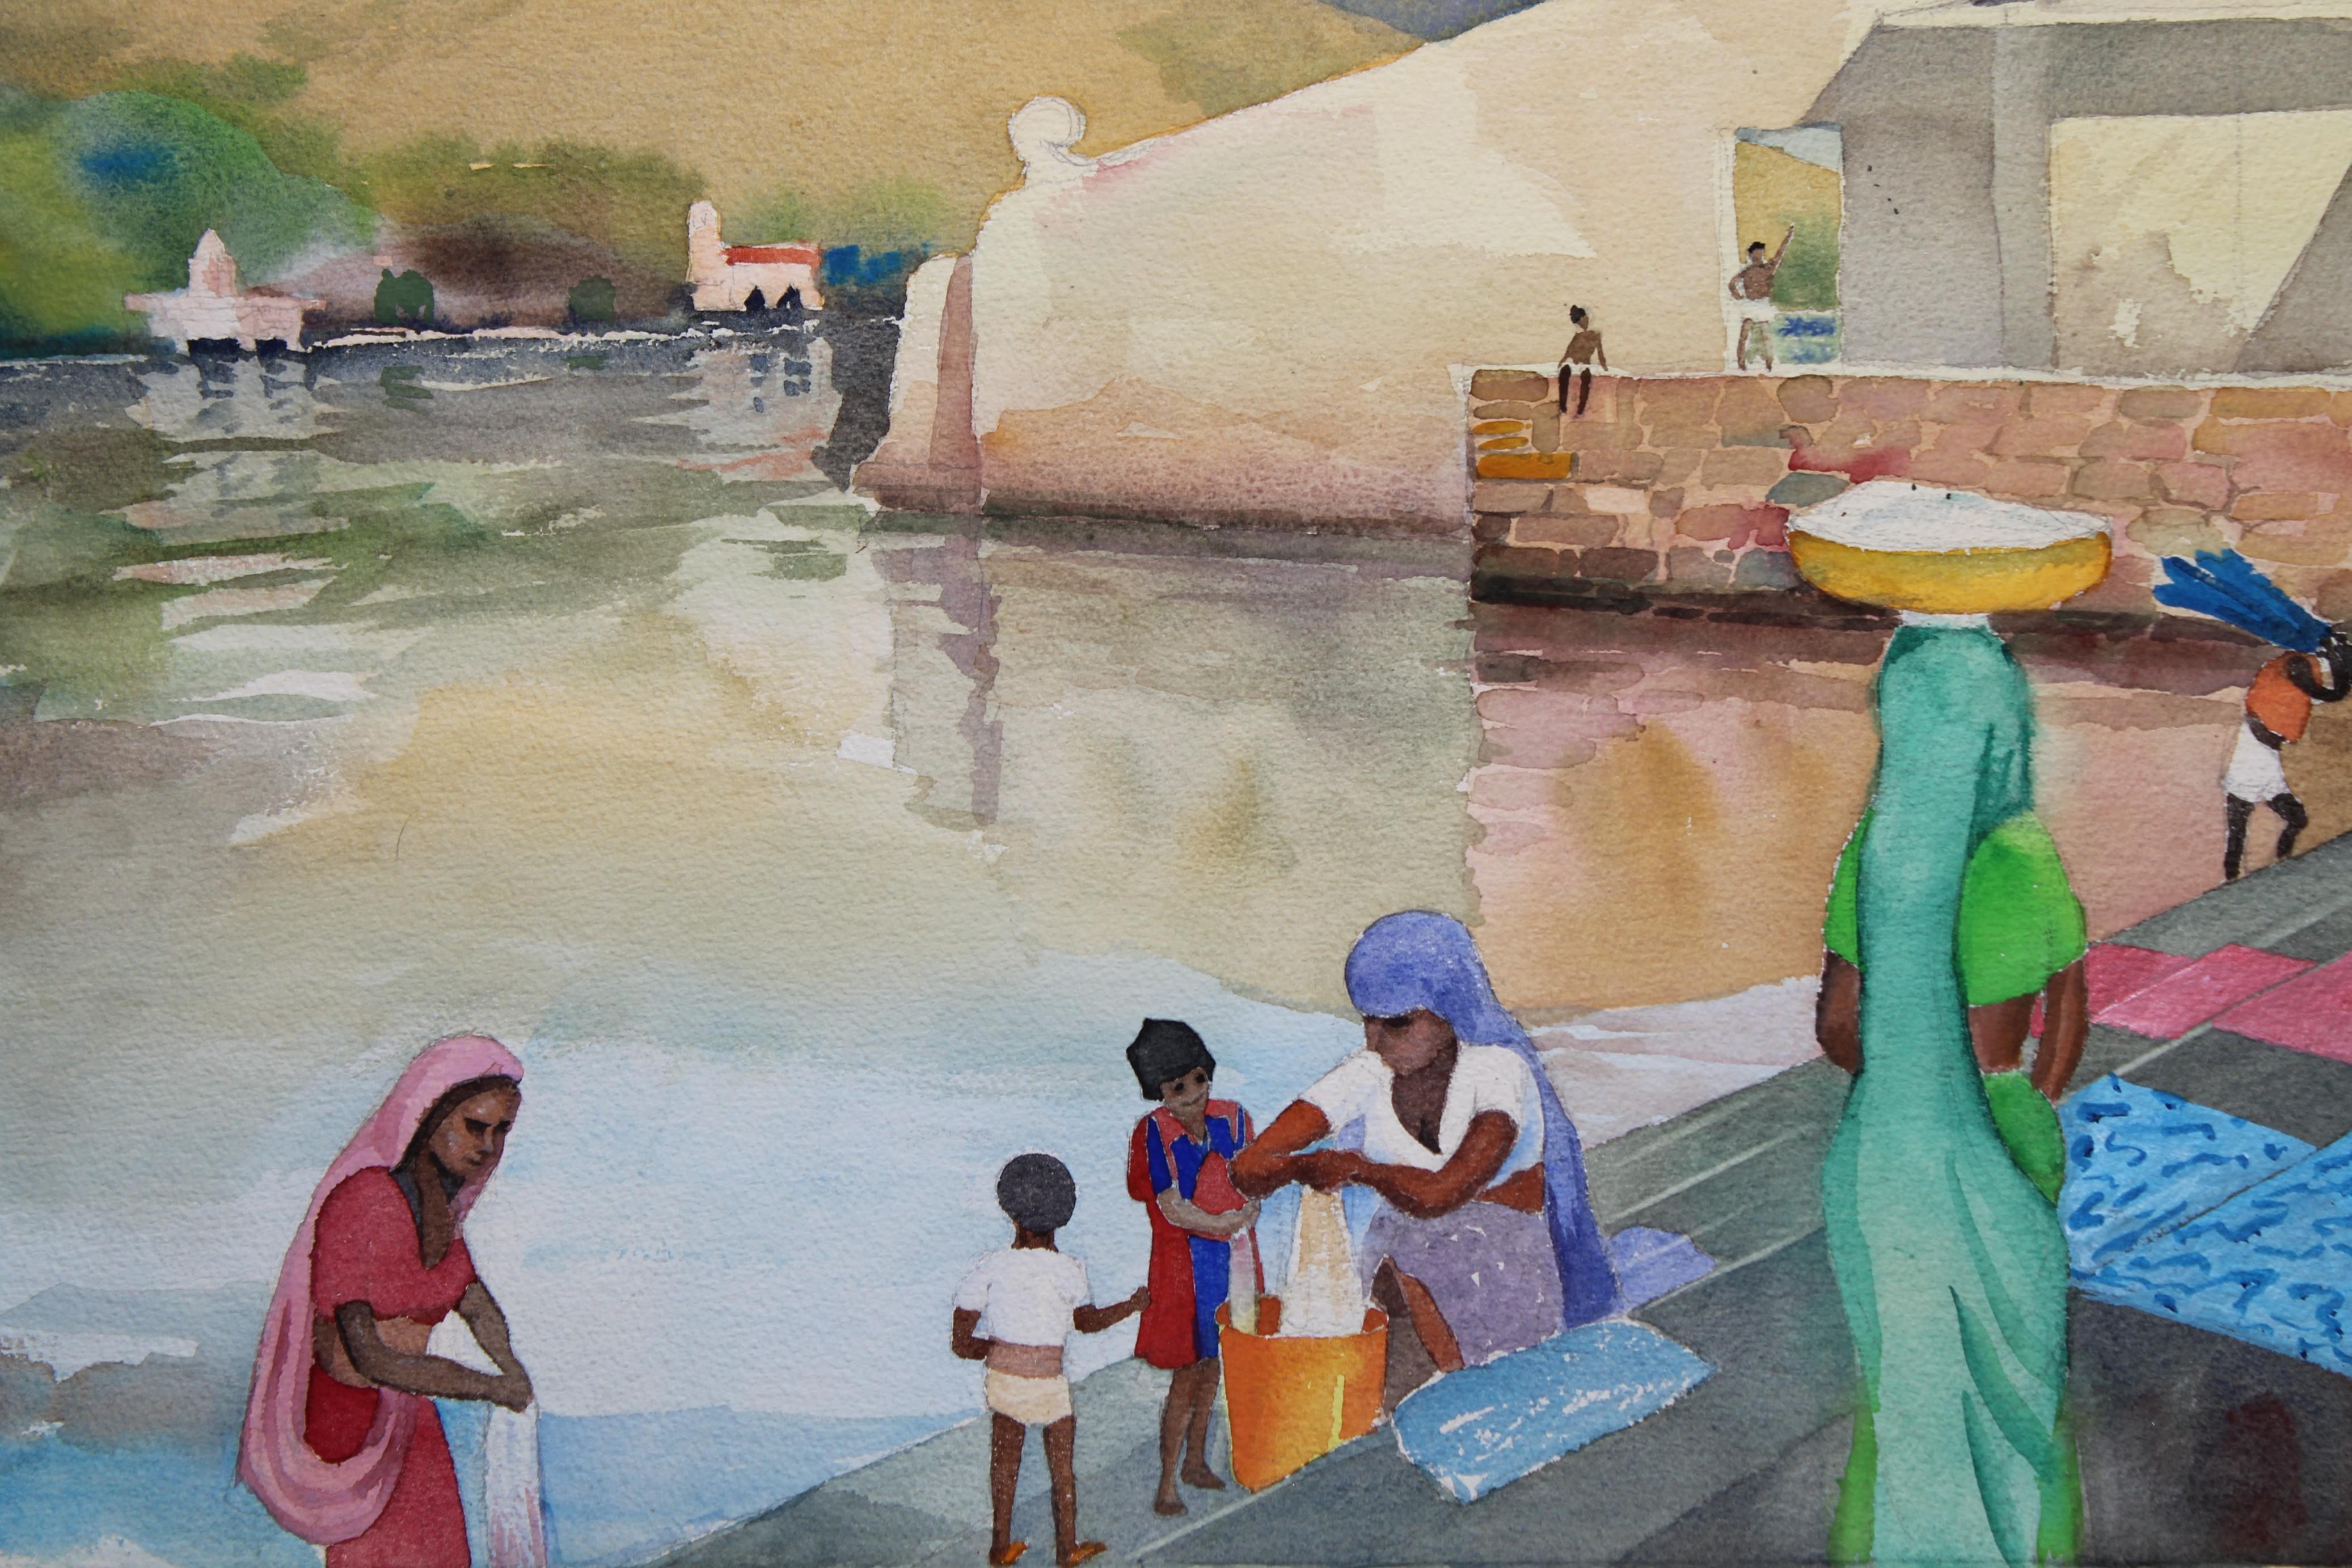 Lot 218 - 20th C. Udaipur India Coastal Watercolor, Signed